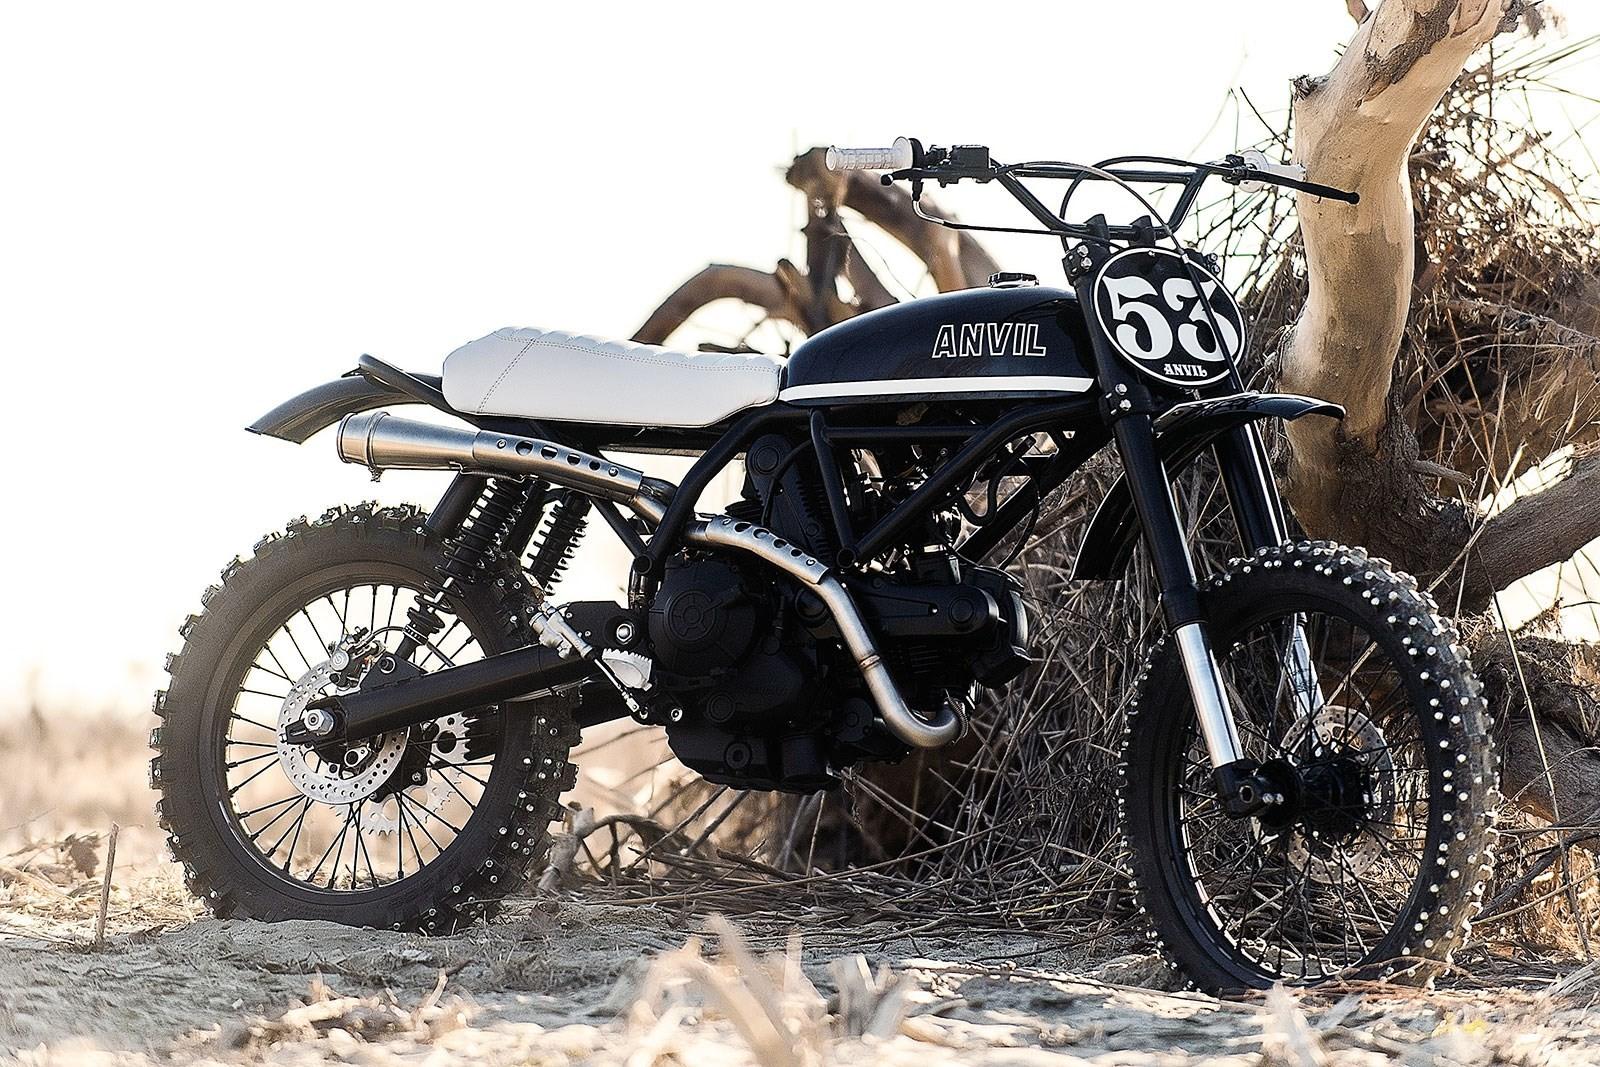 Foto de Ducati Anvil Motociclette (1/6)